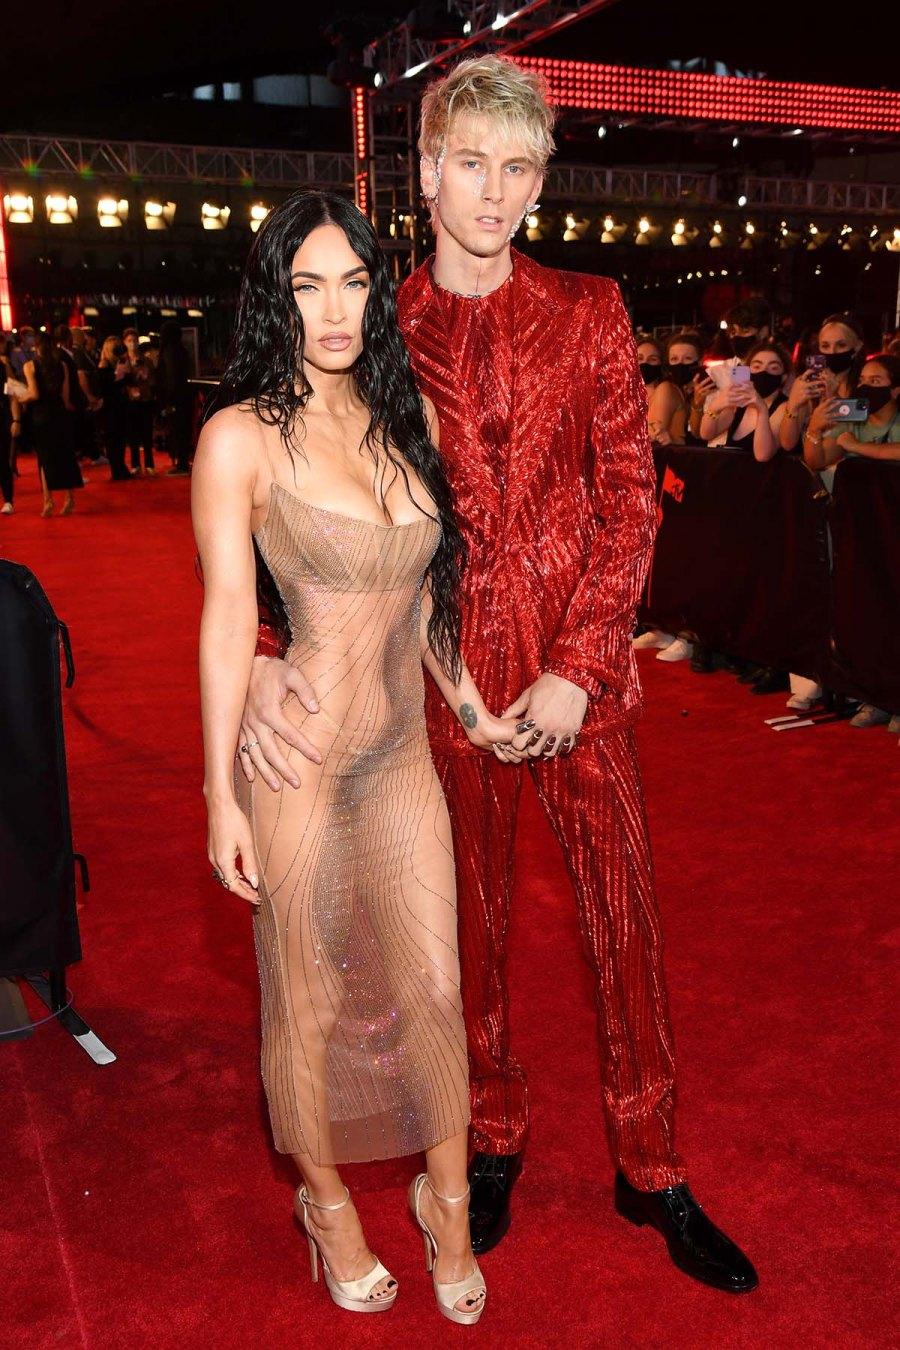 2021 VMAs Whats She Wearing Megan Fox Hold Hands With MGK 2021 VMAs